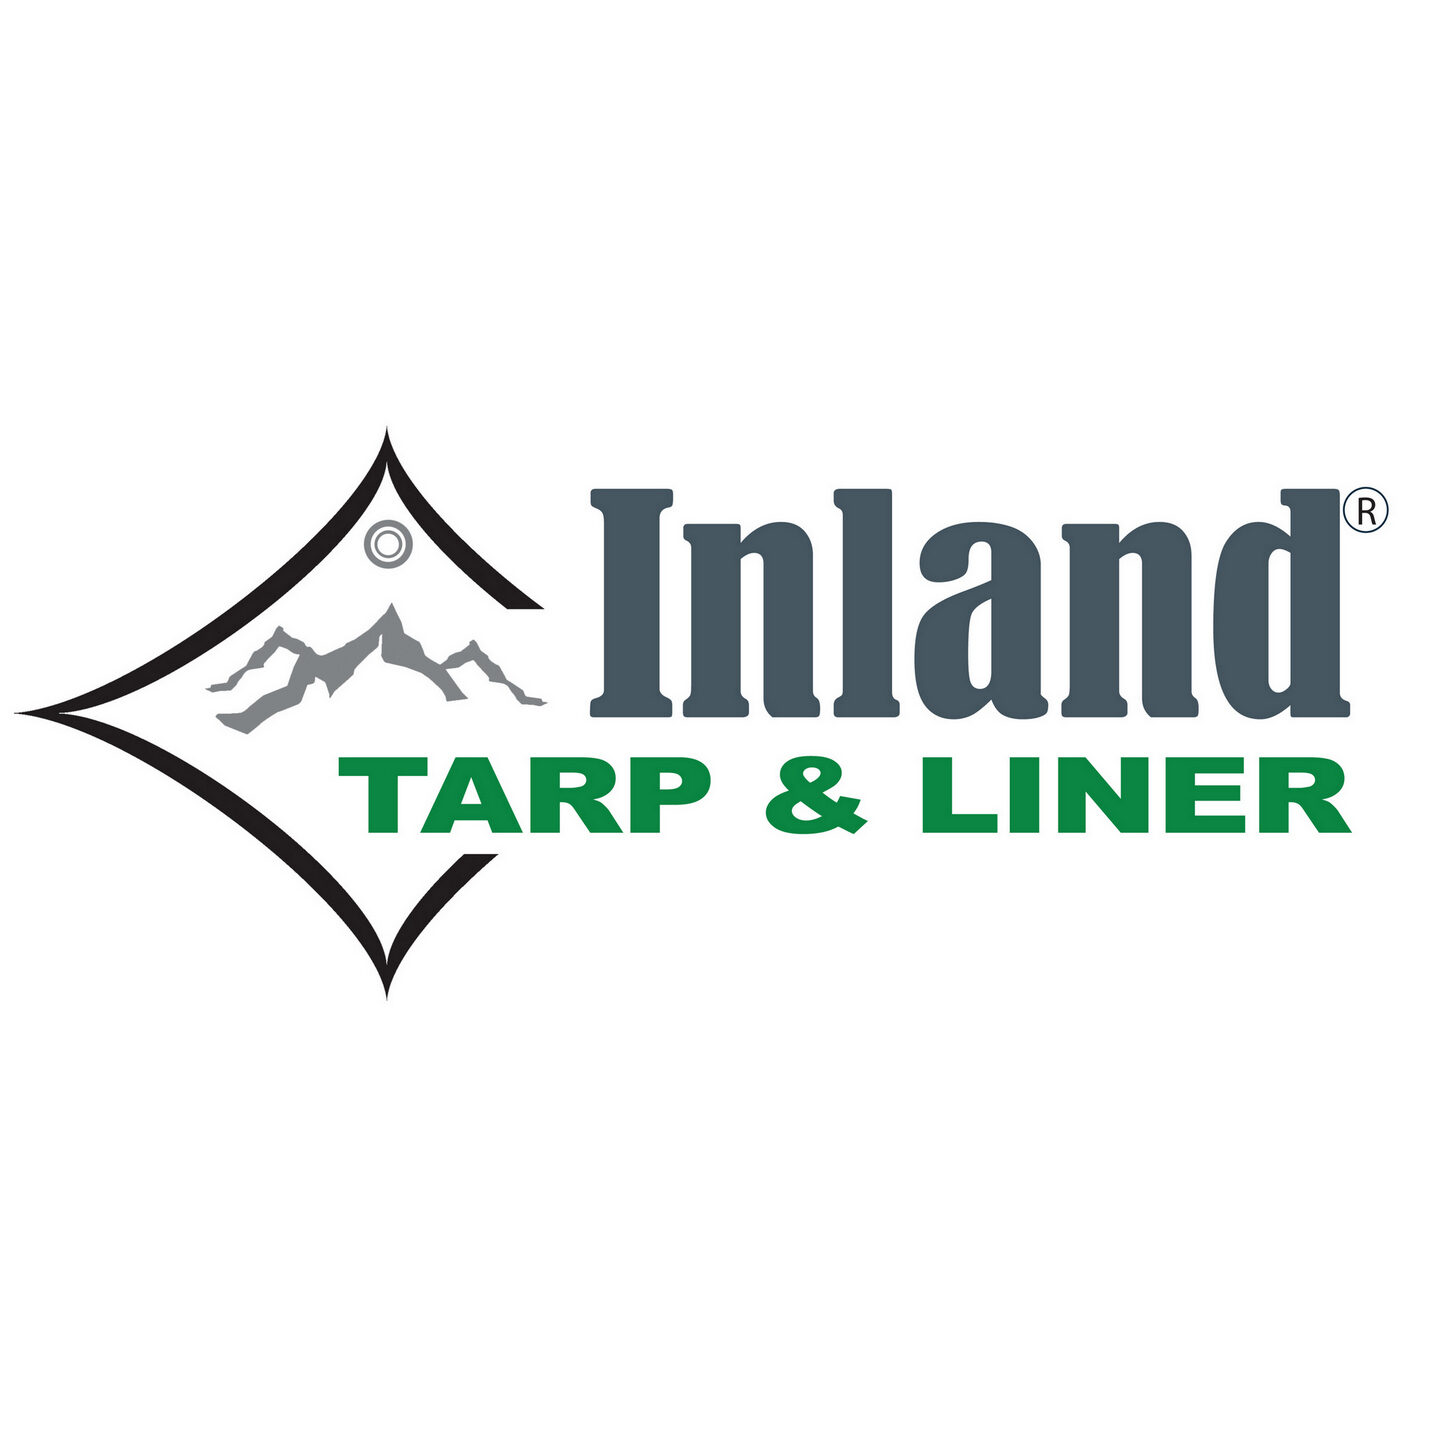 Inland Tarp & Liner®